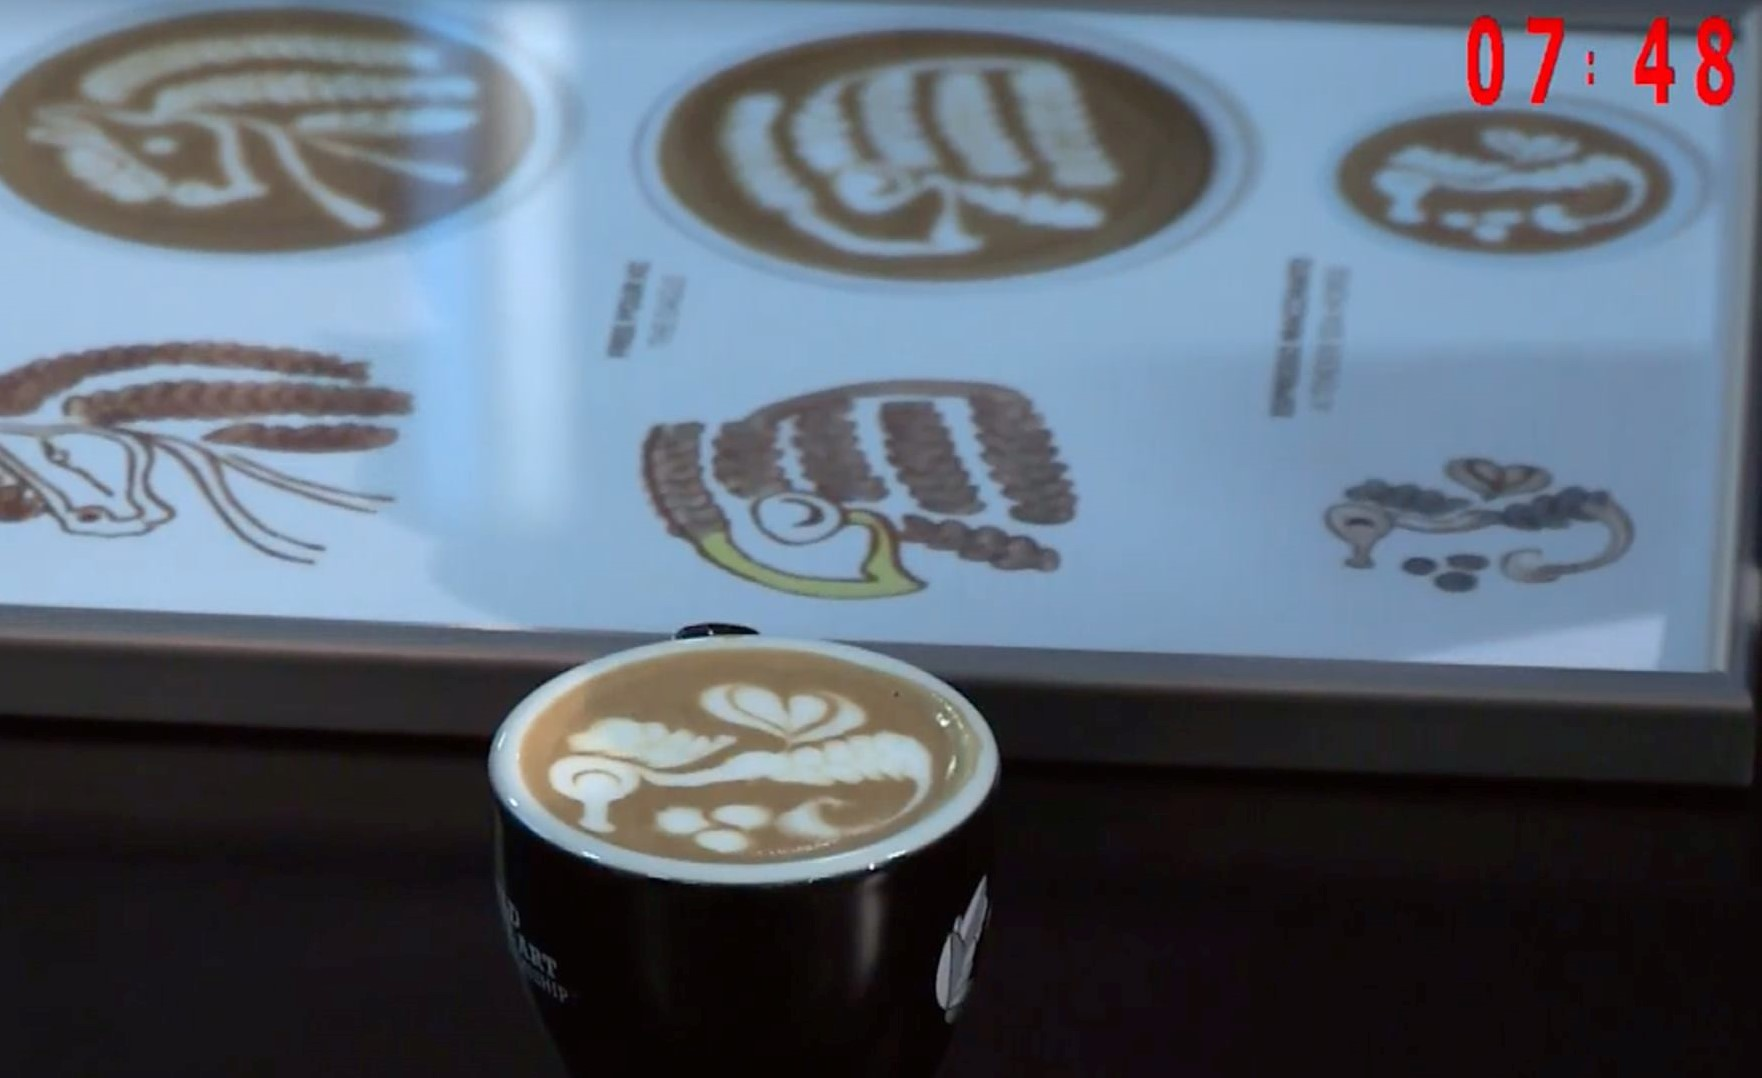 Manuela Fensore - Campionessa Mondiale Latte Art 2019 - foto SCA ITALY